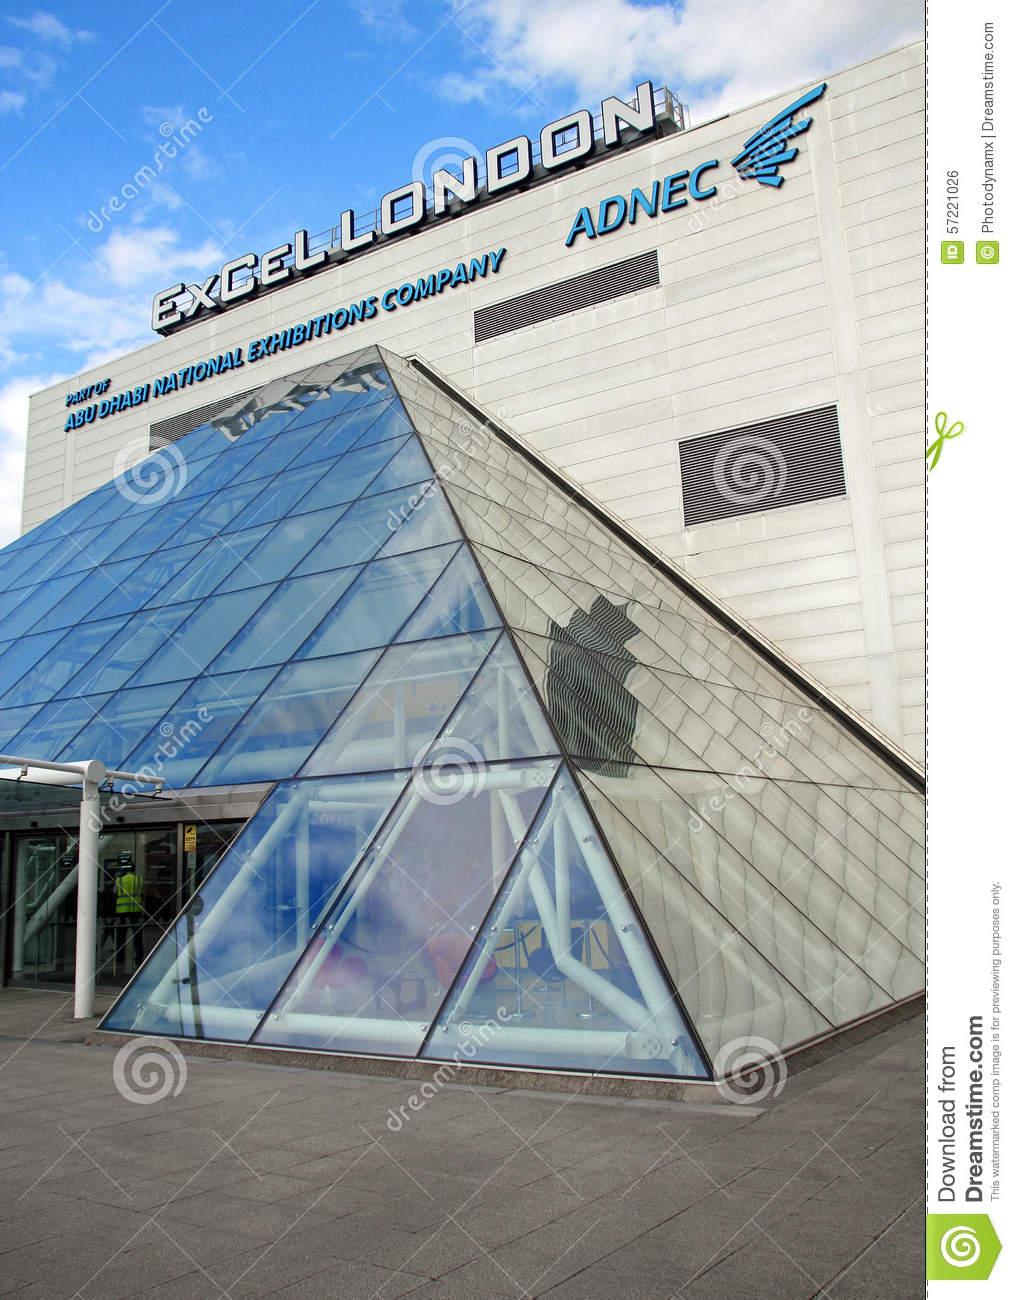 Excel Exhibition Centre London Editorial Photo.